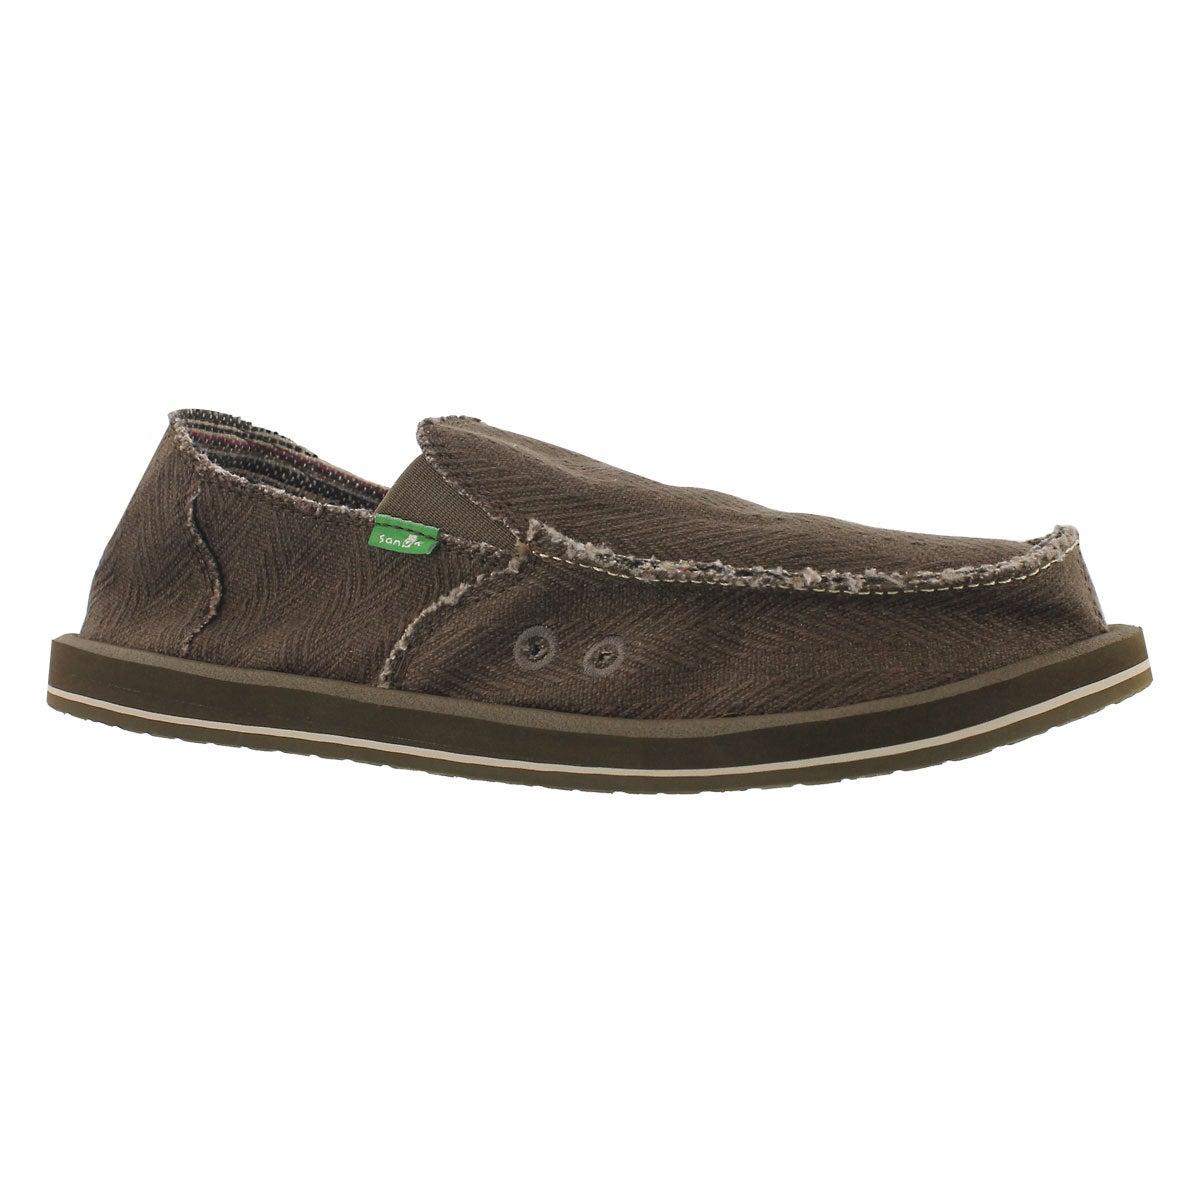 Mns Hemp olive slip on shoe